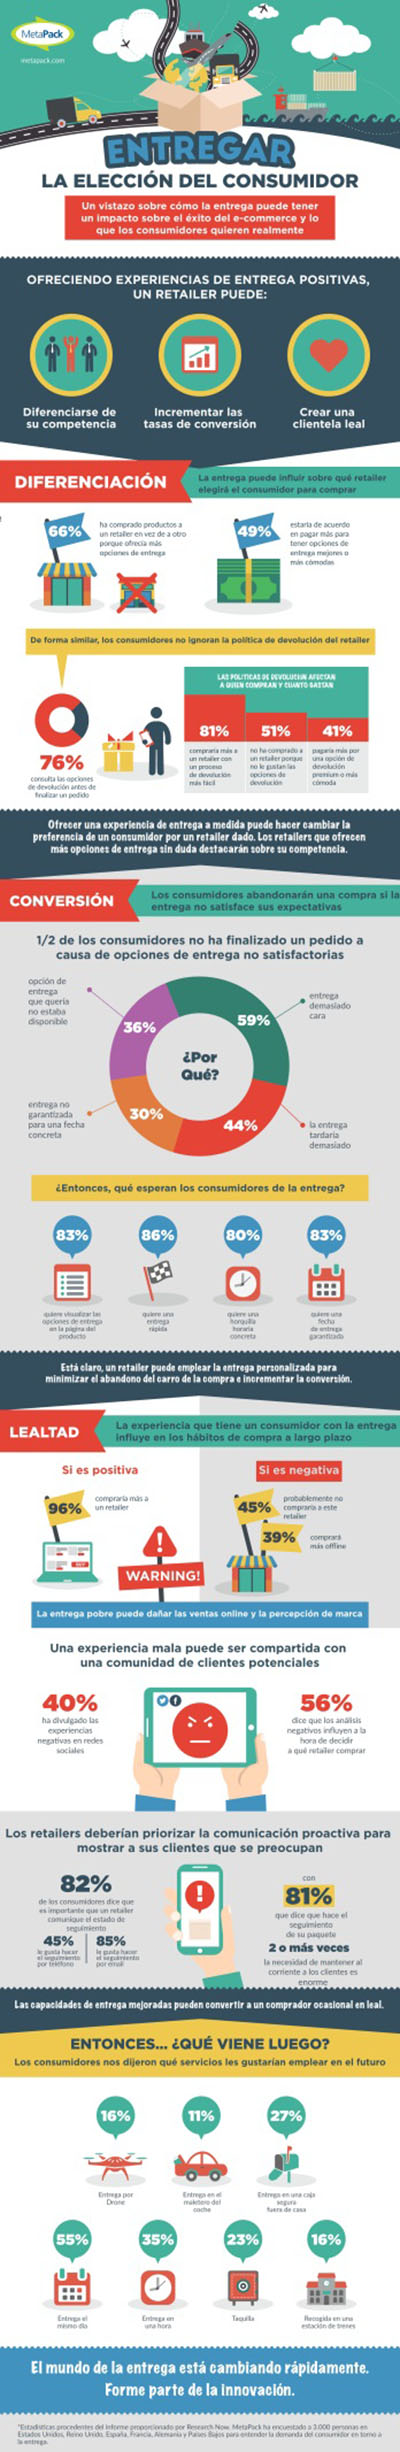 metapack_infografia_ecommerce